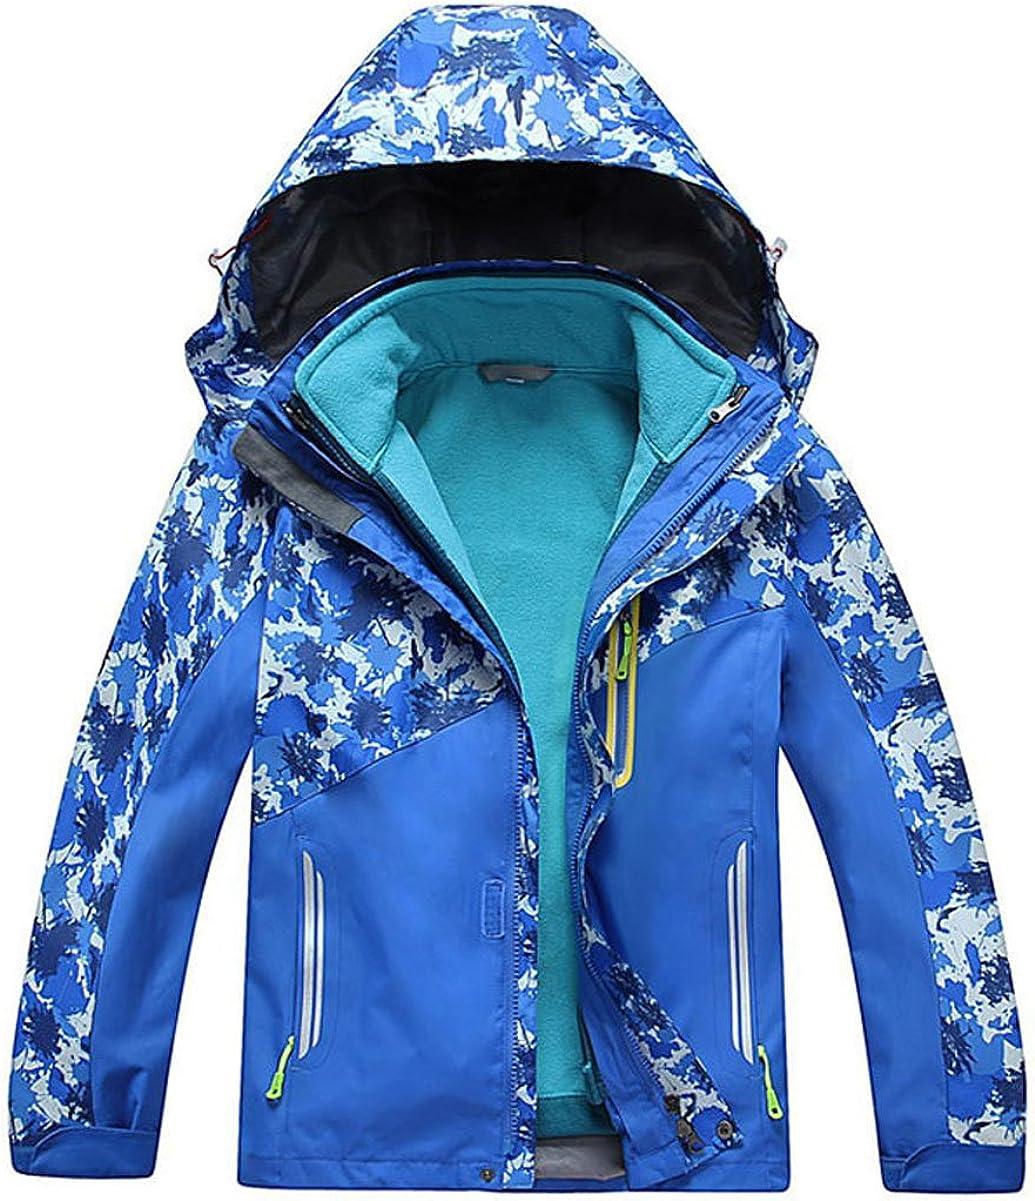 M2C Boys Girls Hooded Fleece Lined Waterproof Windbreaker Active Jacket